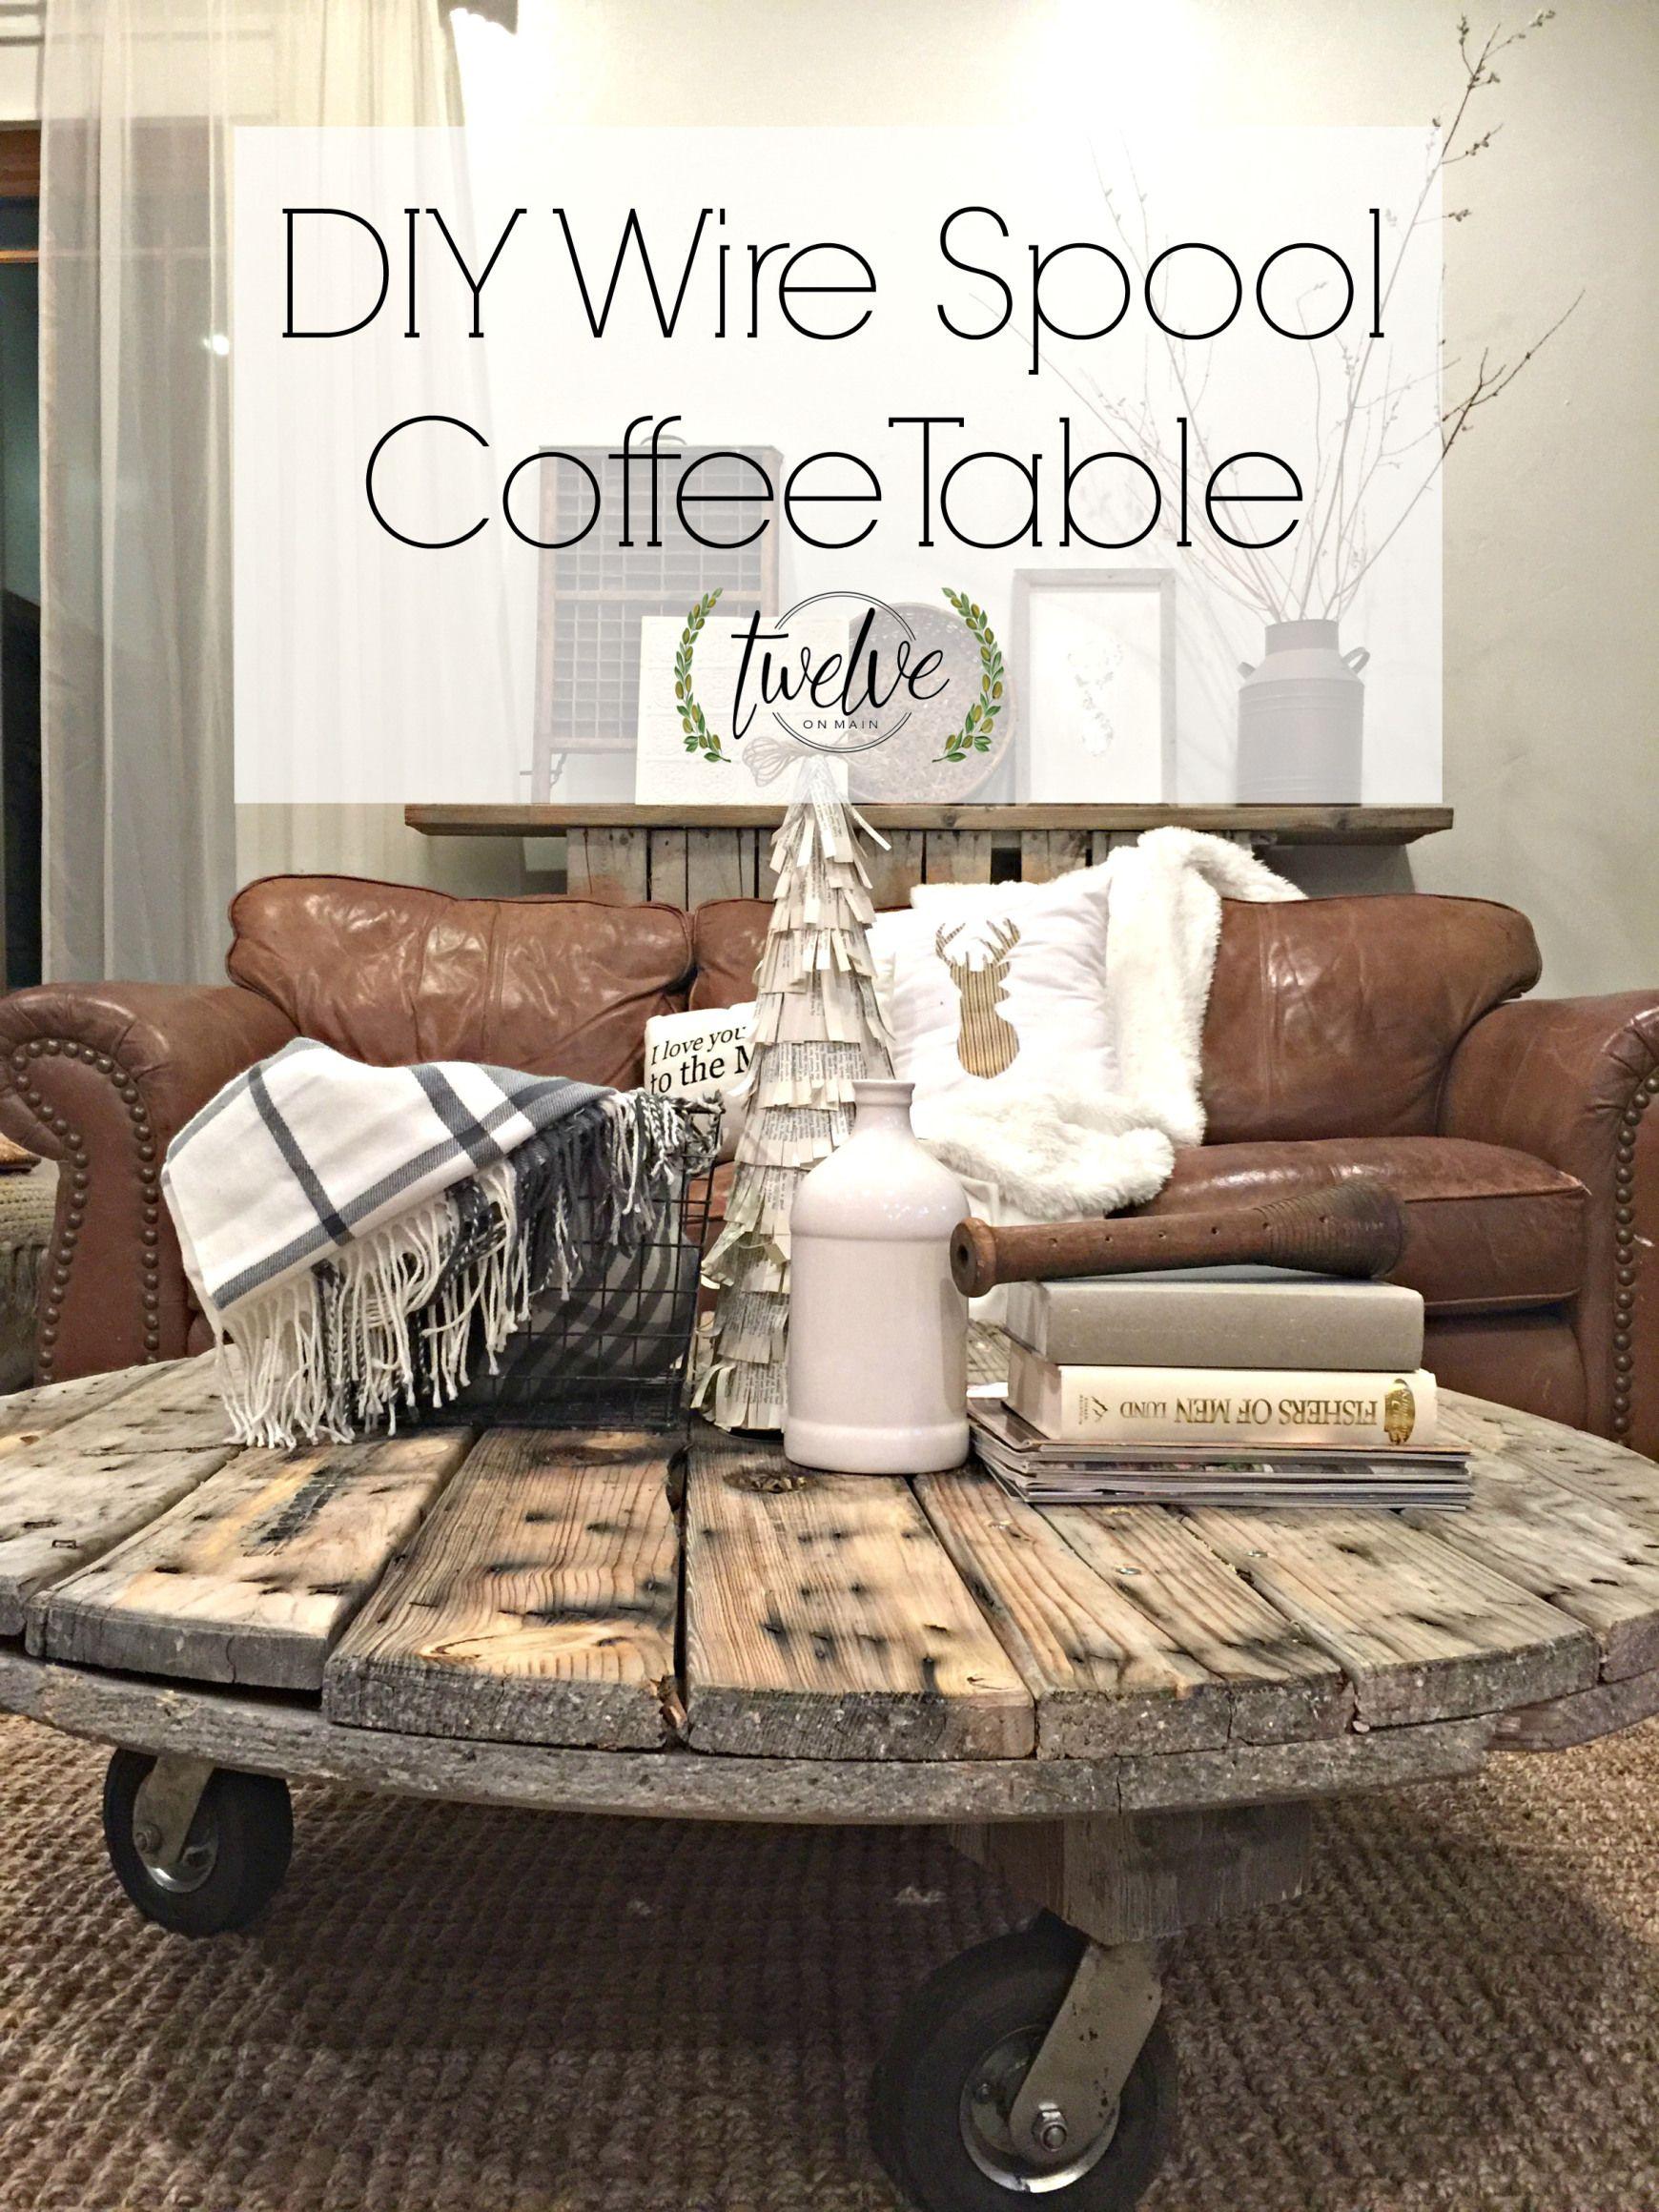 Remarkable Diy Wire Spool Coffee Table Repurpose Diy Furniture Download Free Architecture Designs Intelgarnamadebymaigaardcom